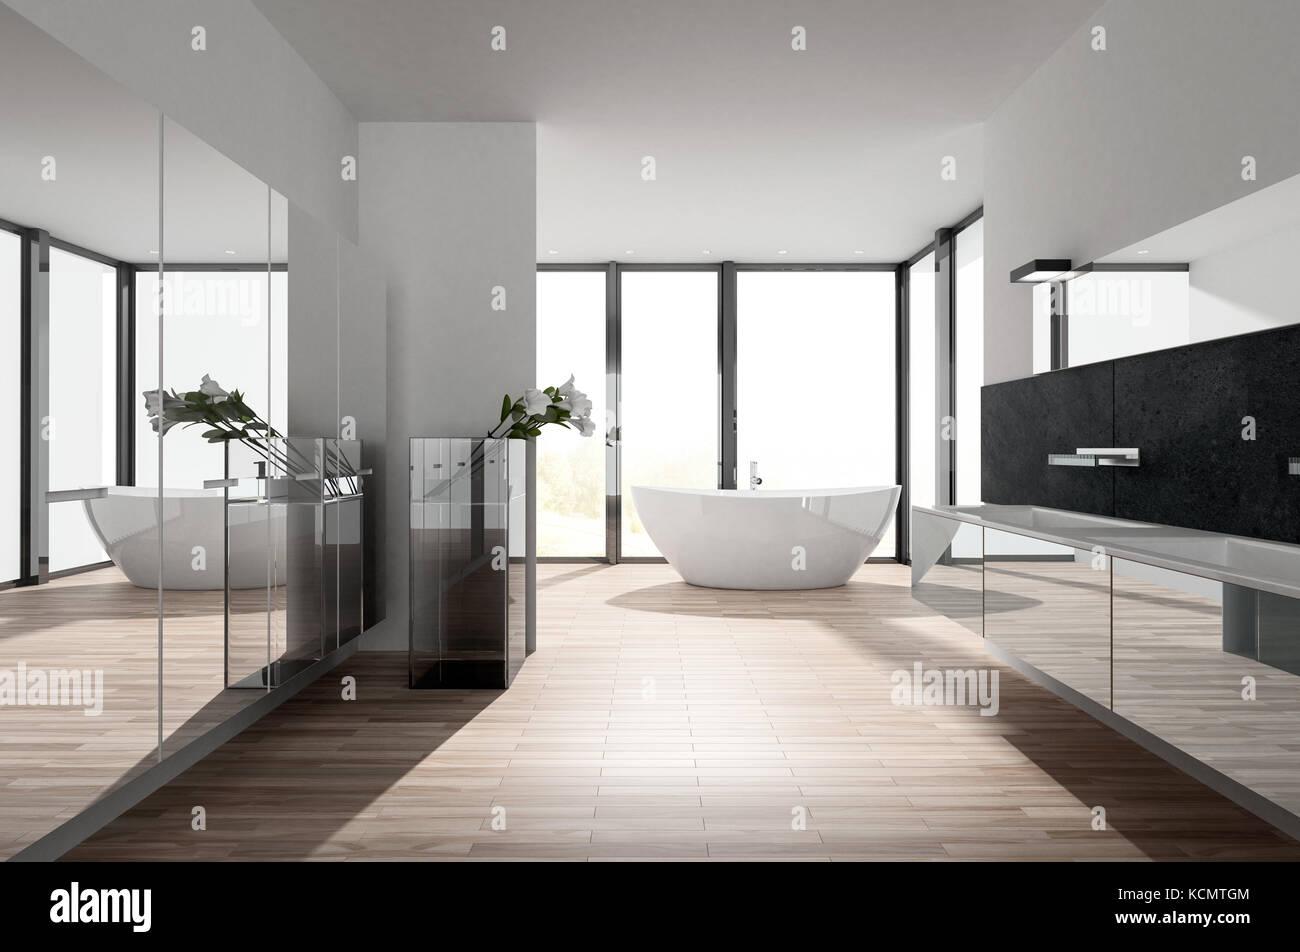 Salle de bains de luxe moderne ensoleillée avec un mur ...